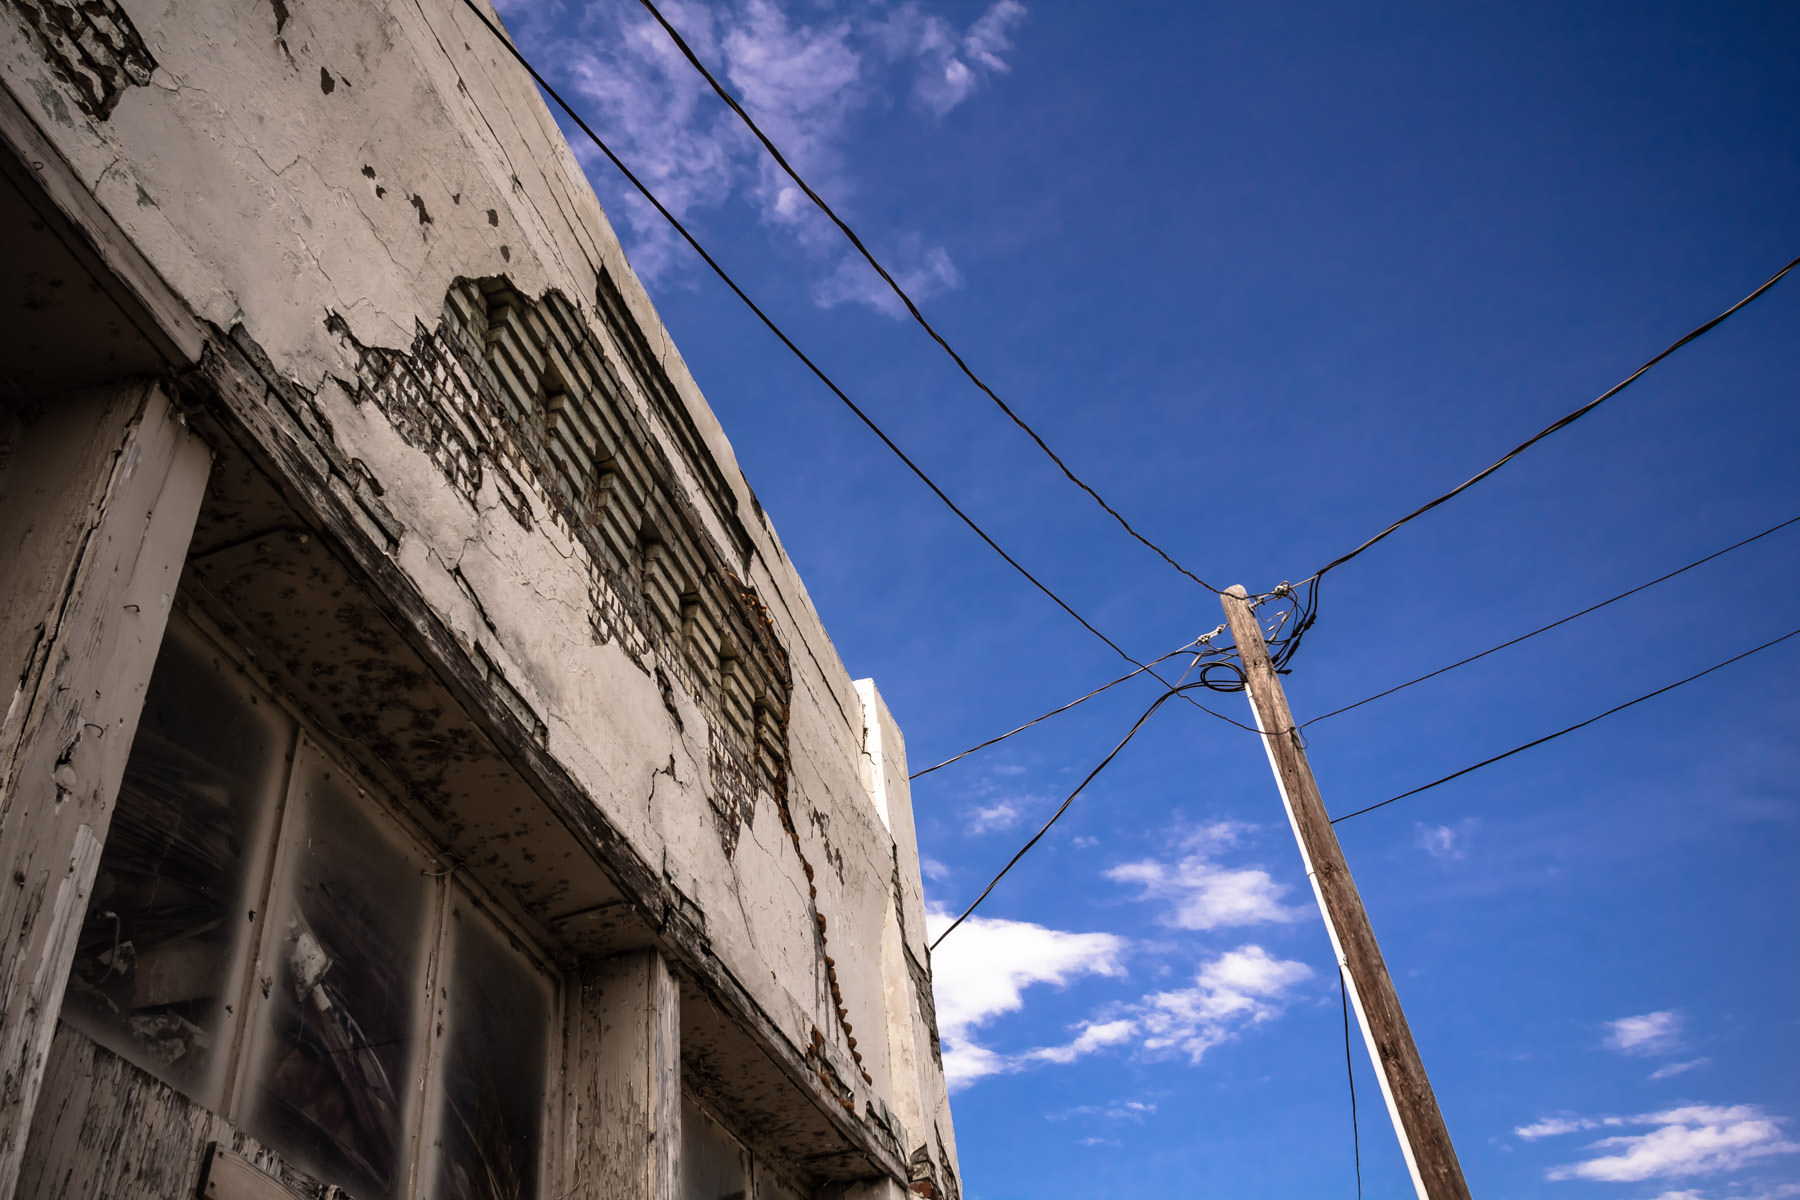 Urban decay in McKinney, Texas.